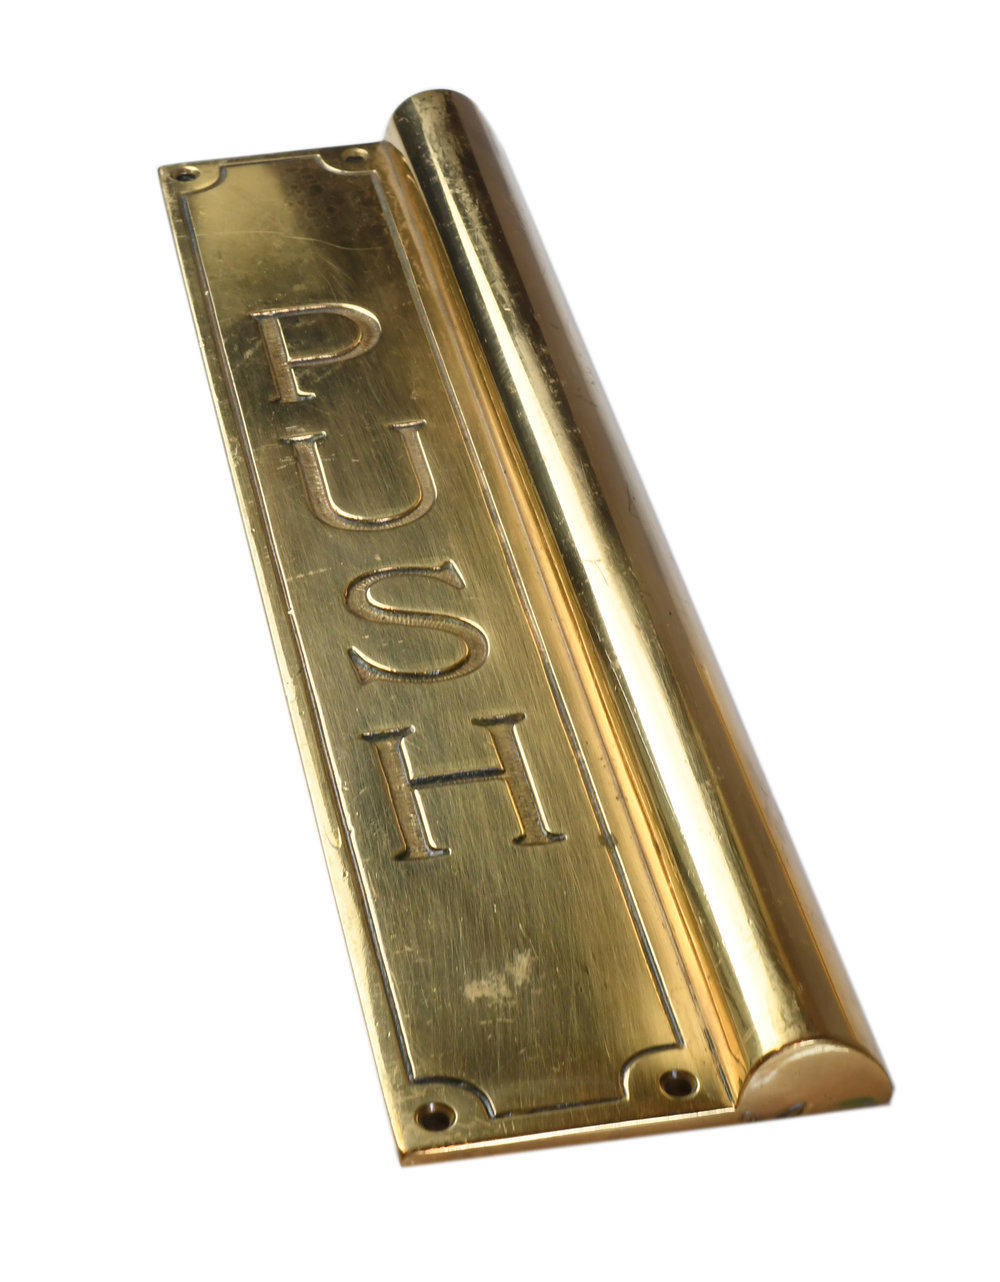 H20172-cast-brass-PUSH-plates-back-detail-19.jpg